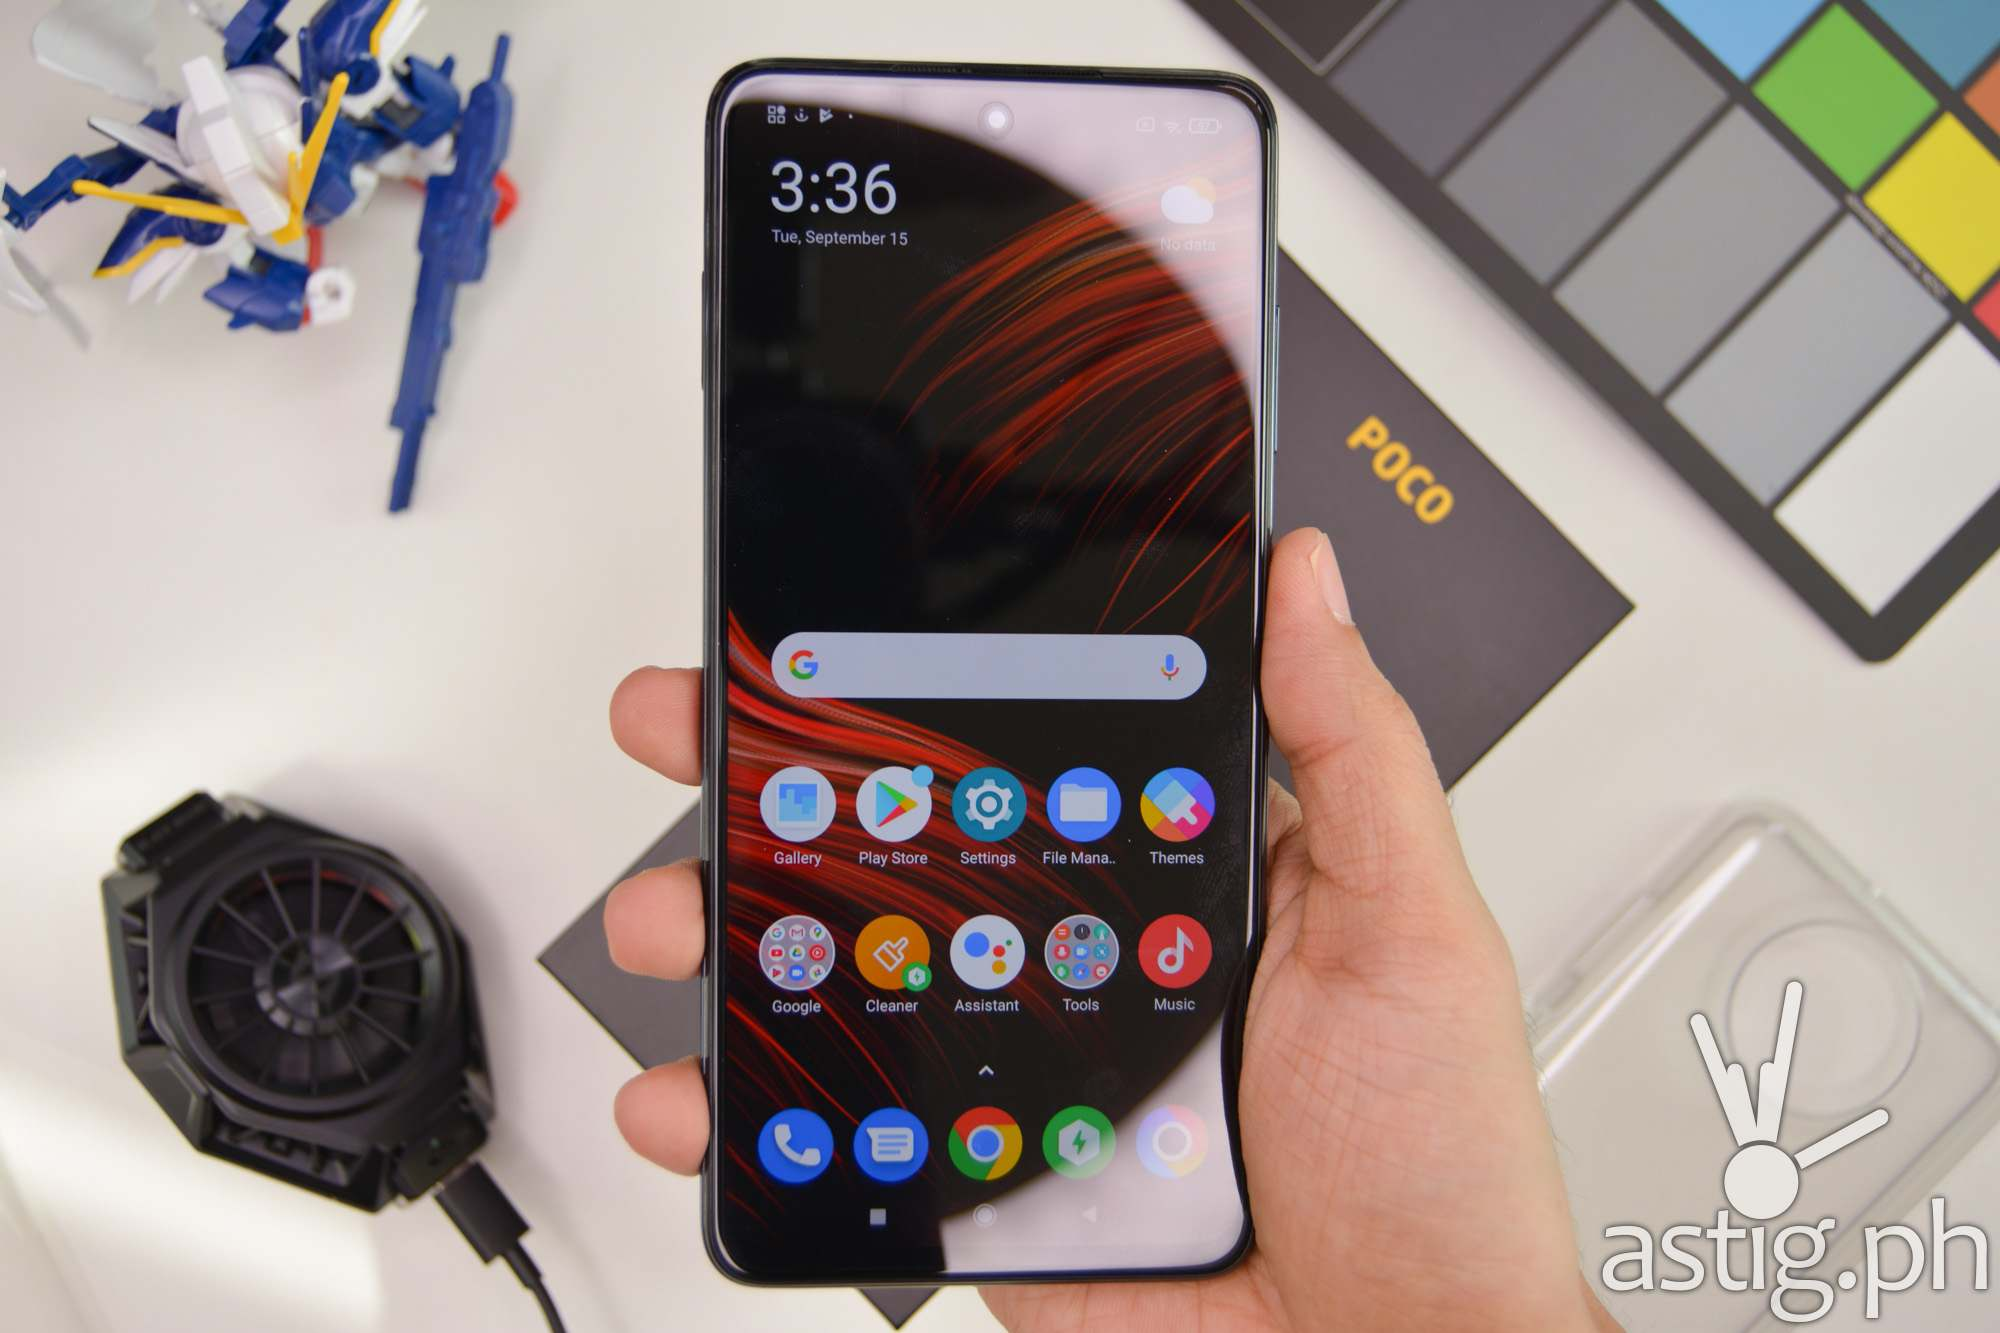 Handheld- 202009 POCO X3 NFC (Philippines)